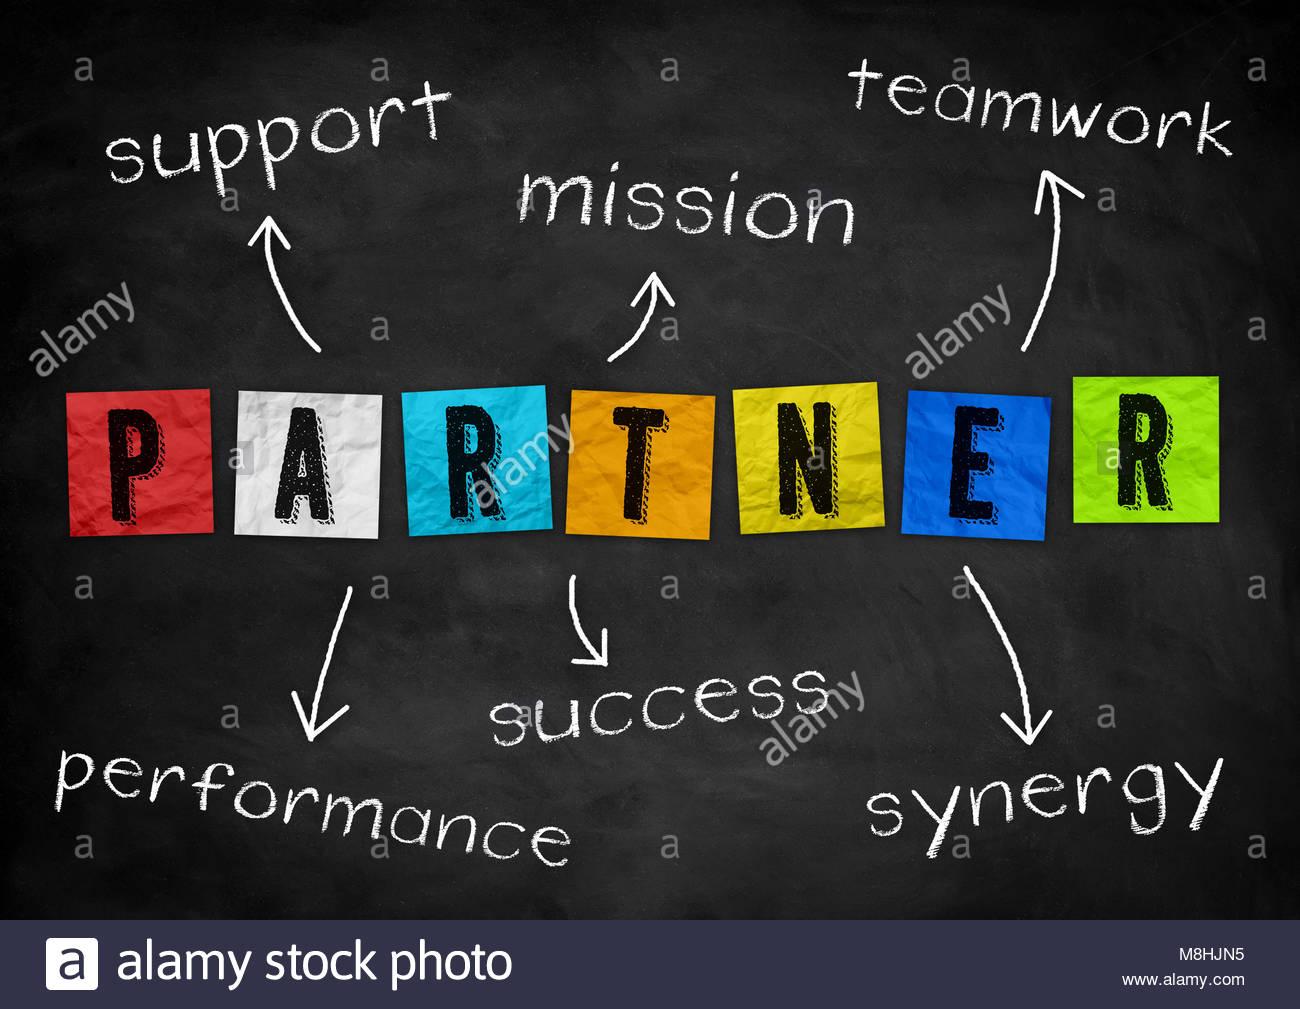 PARTNER - Concepto de negocio Imagen De Stock